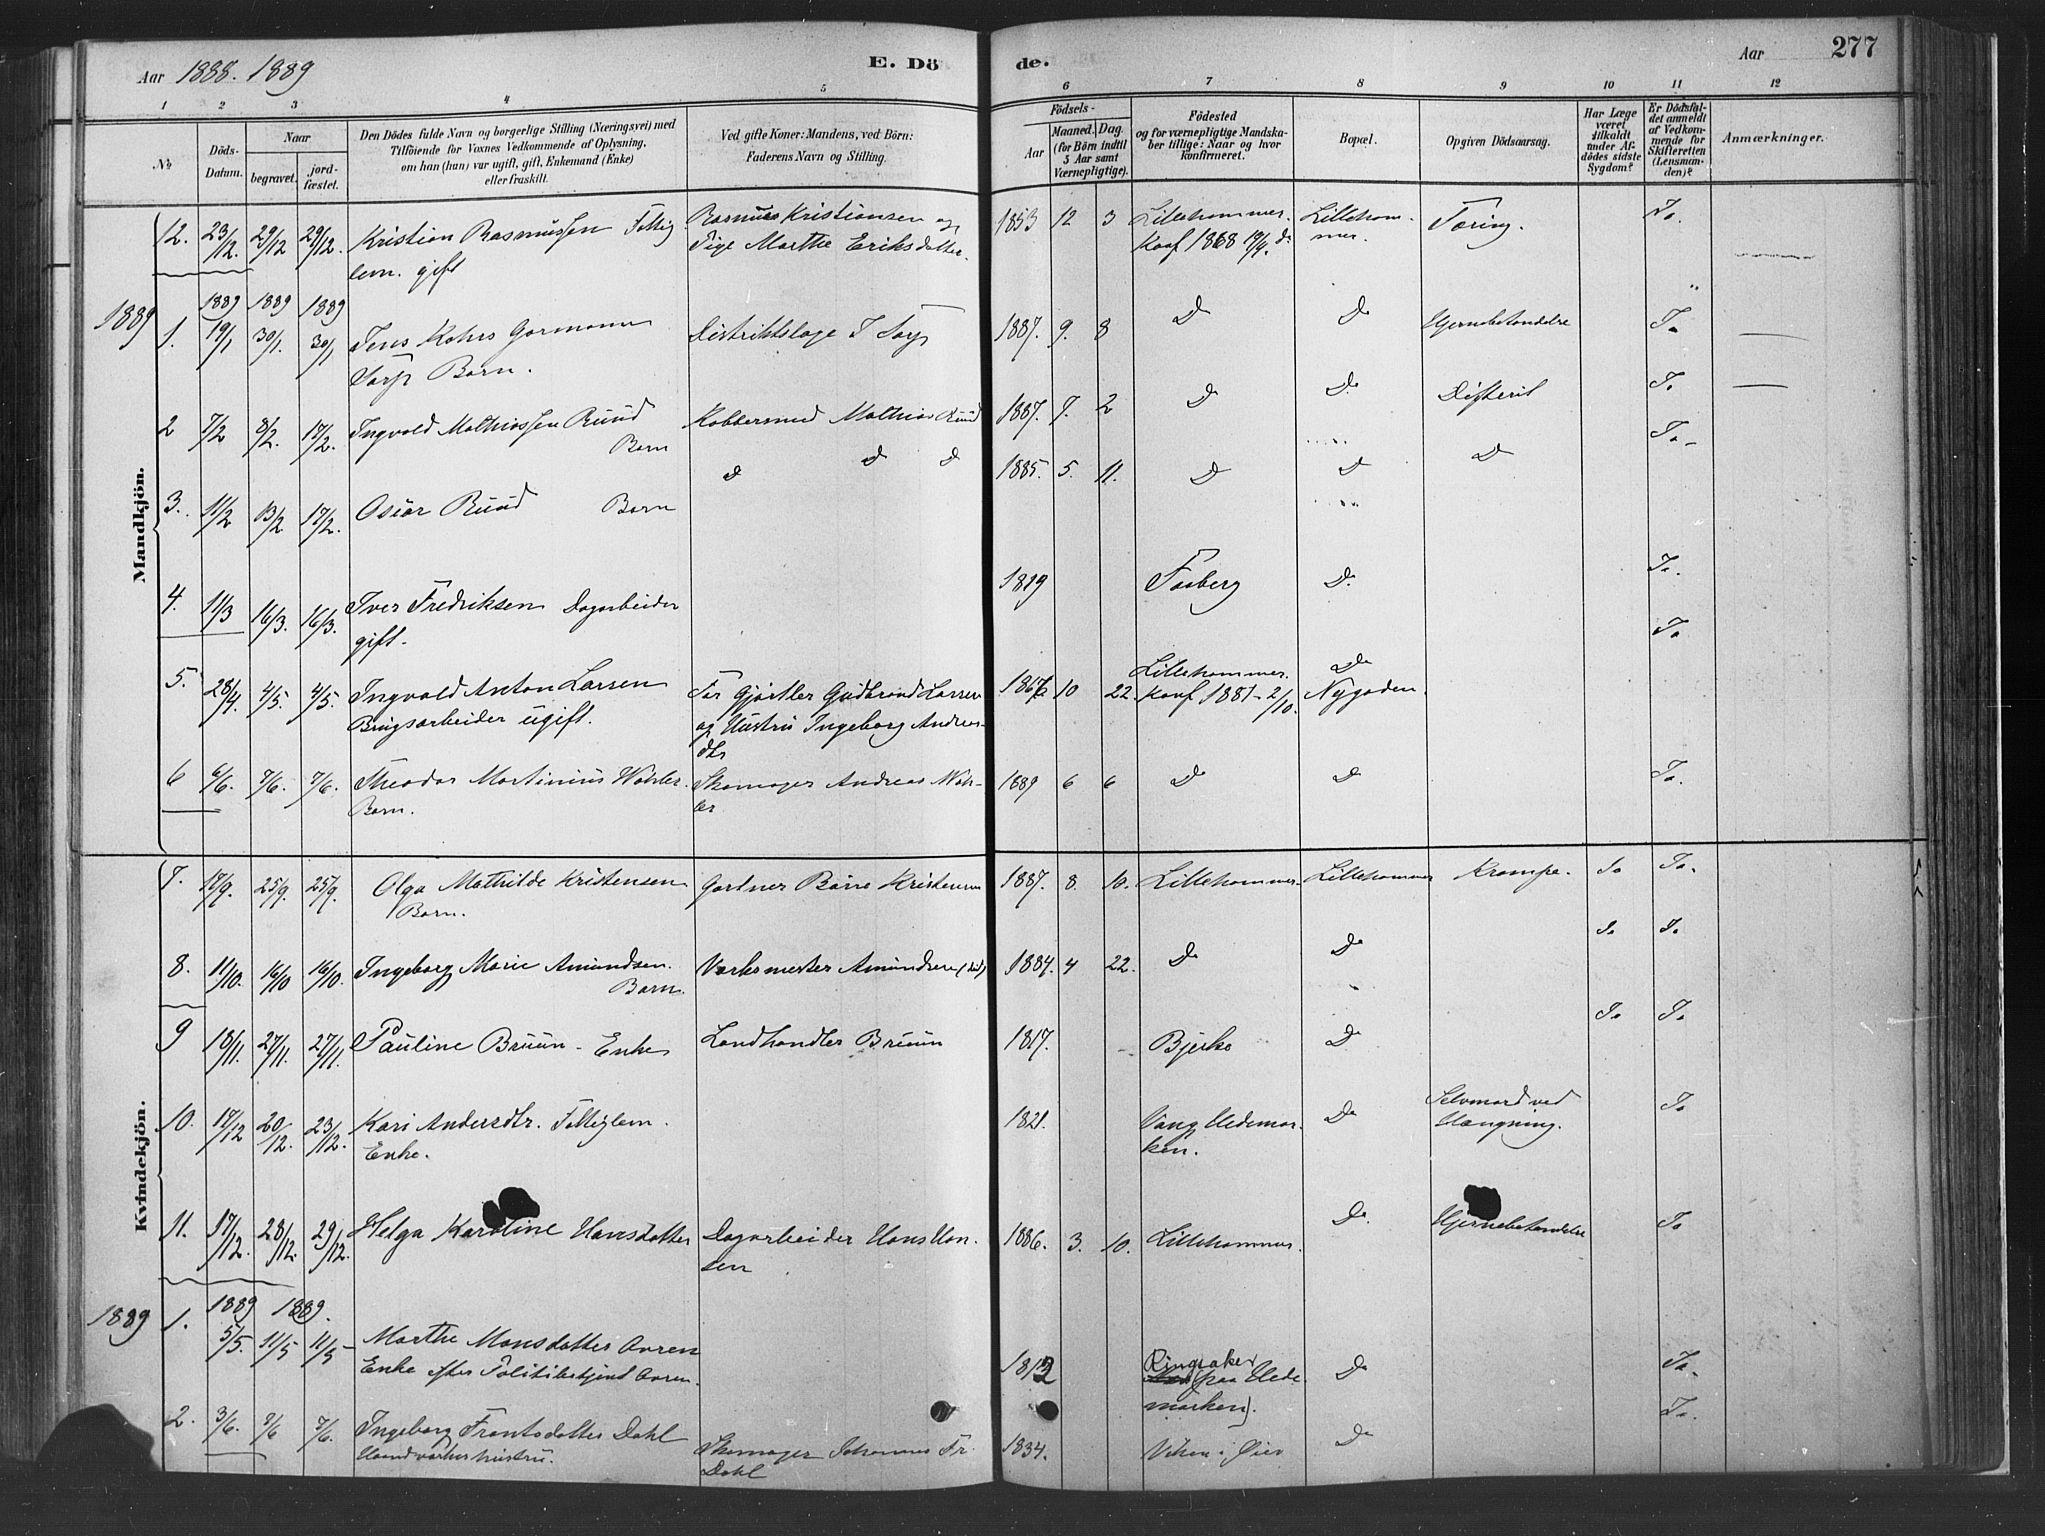 SAH, Fåberg prestekontor, Ministerialbok nr. 10, 1879-1900, s. 277